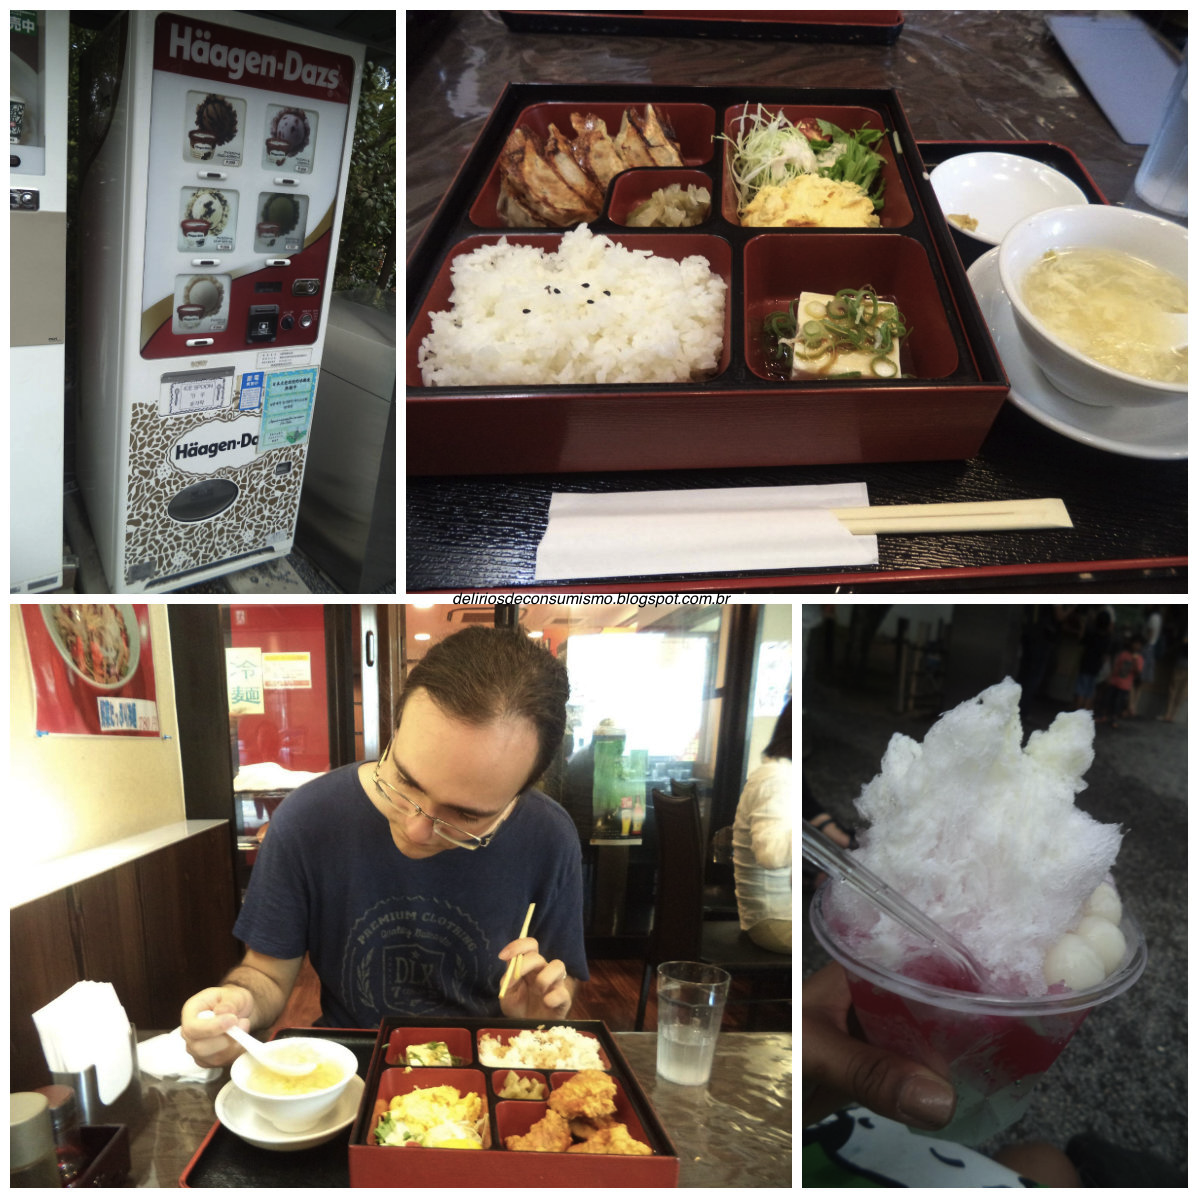 Kyoto, Quioto, Japão, Japão, trip, travel, food, raspadinha, kakigouri, bentô, karaage, gyoza, sorvete, icecream, Haagen-Dazs